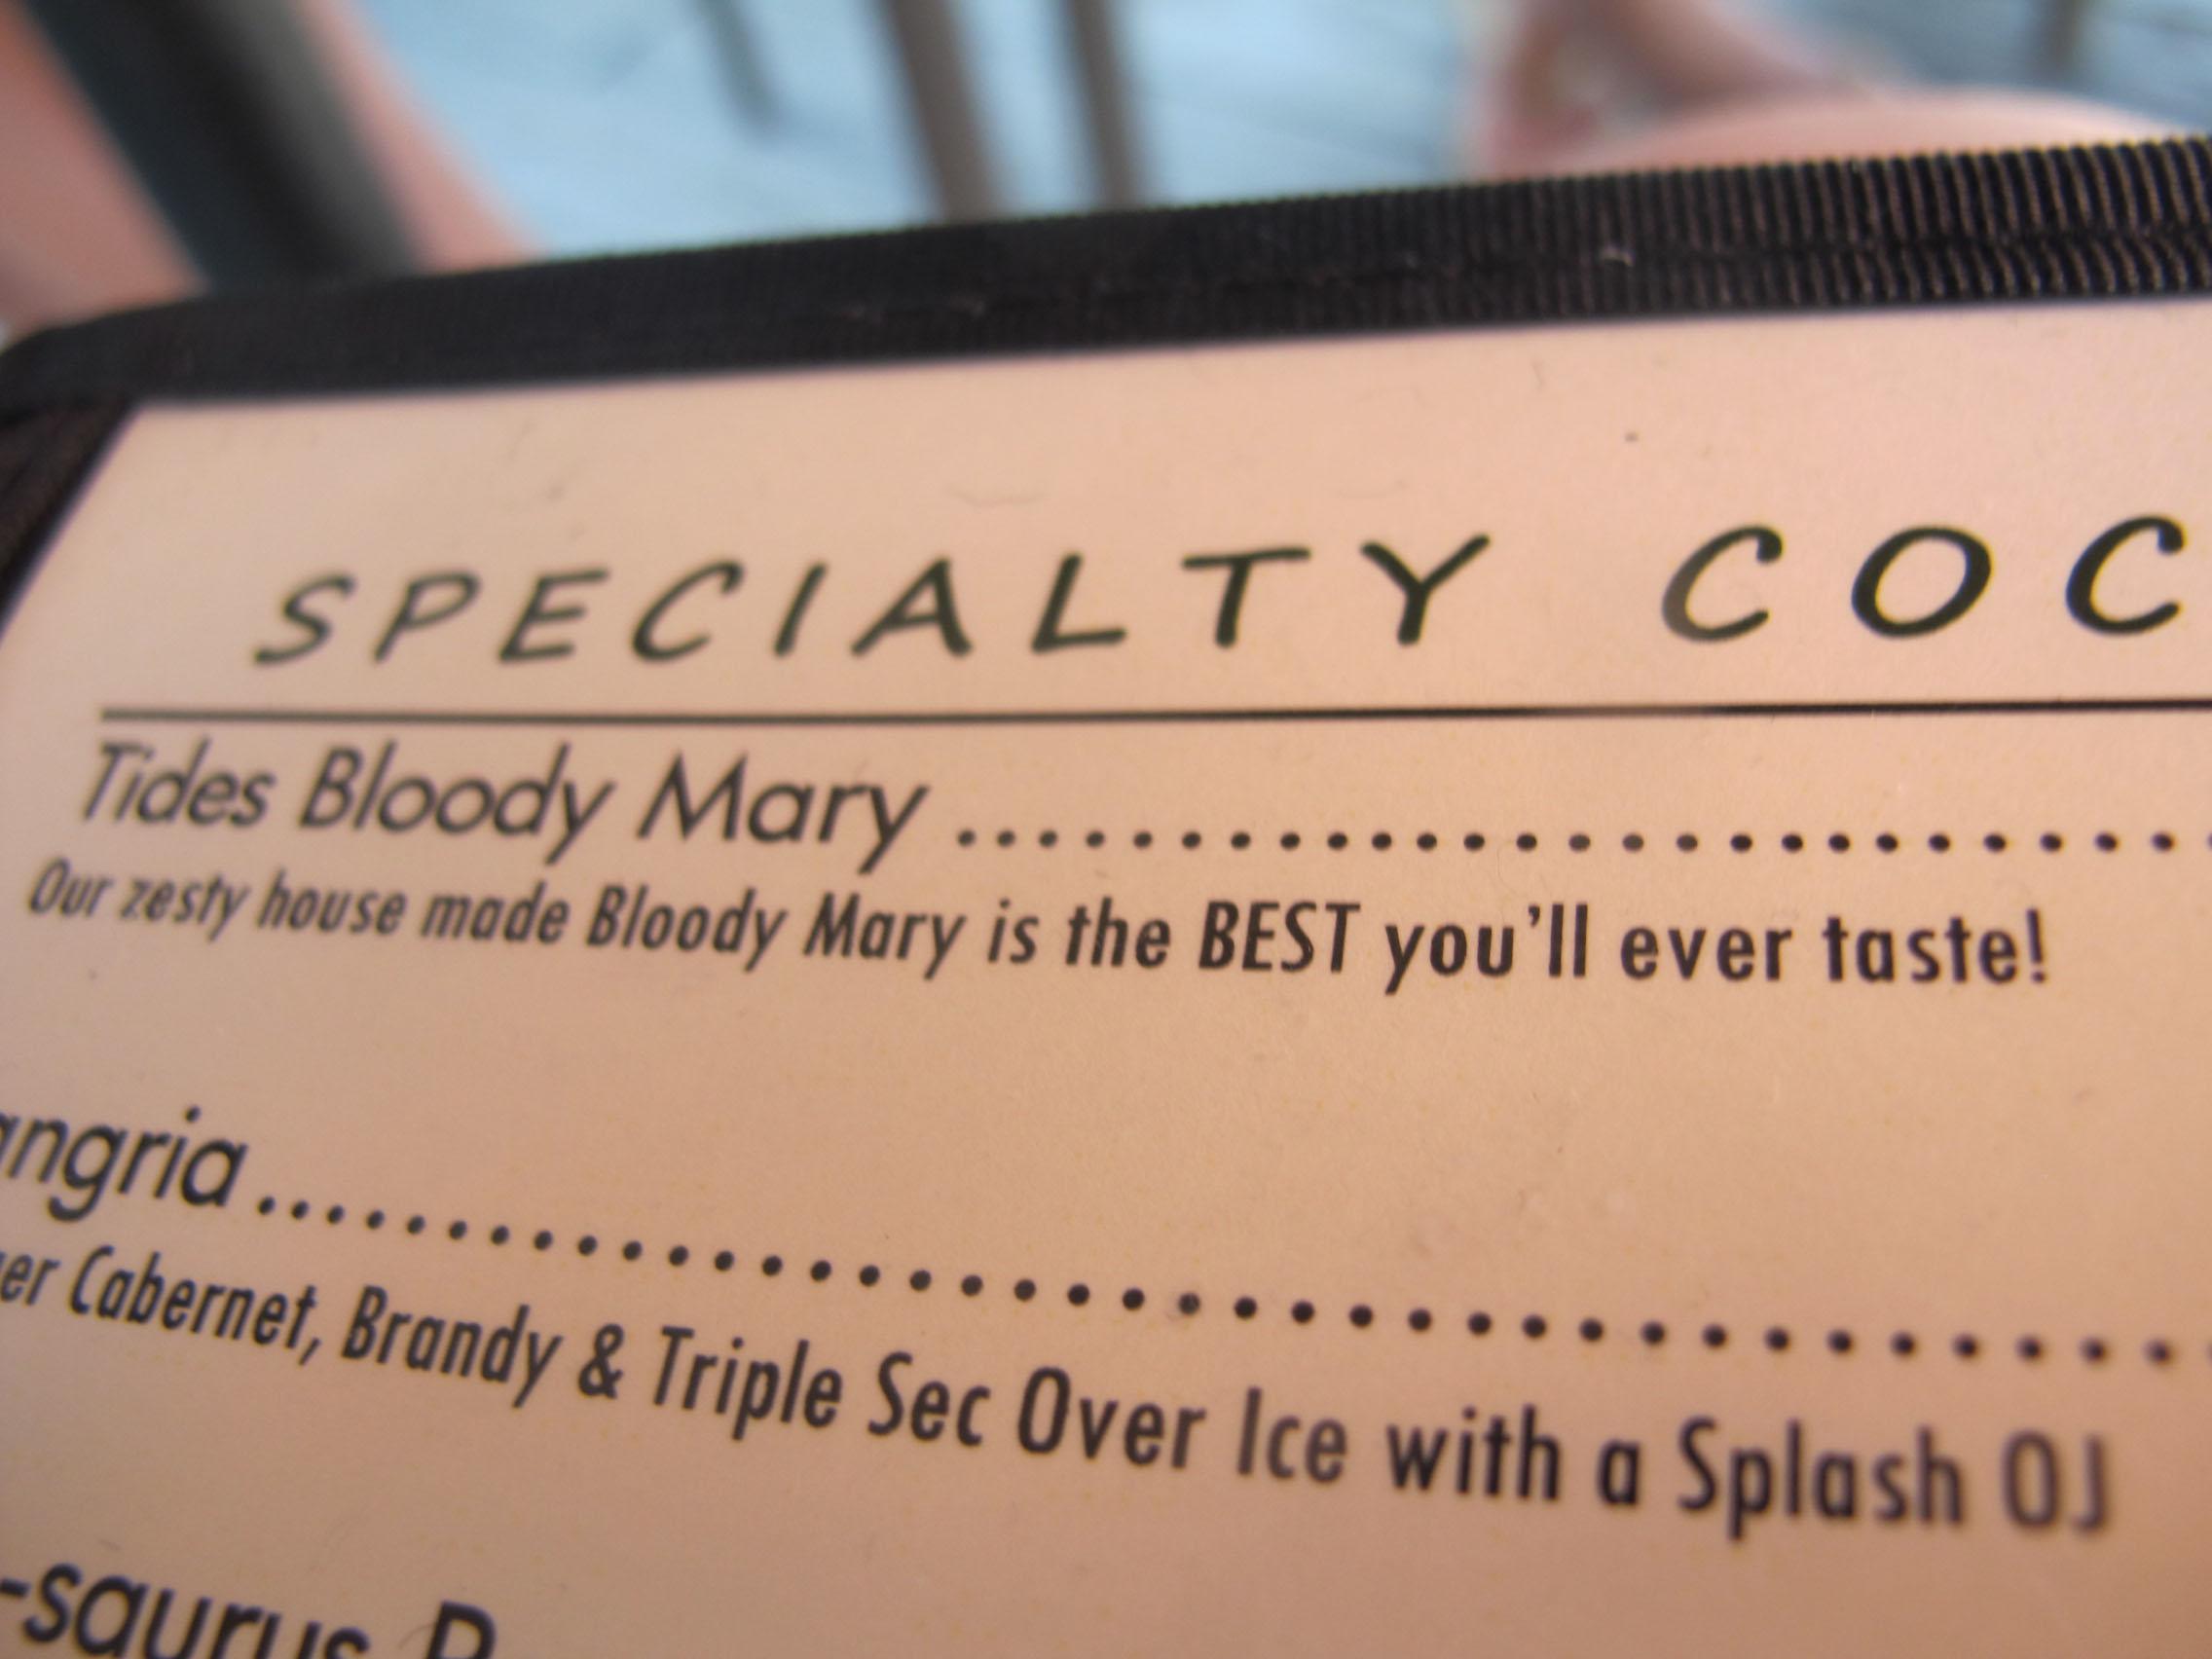 tides menu